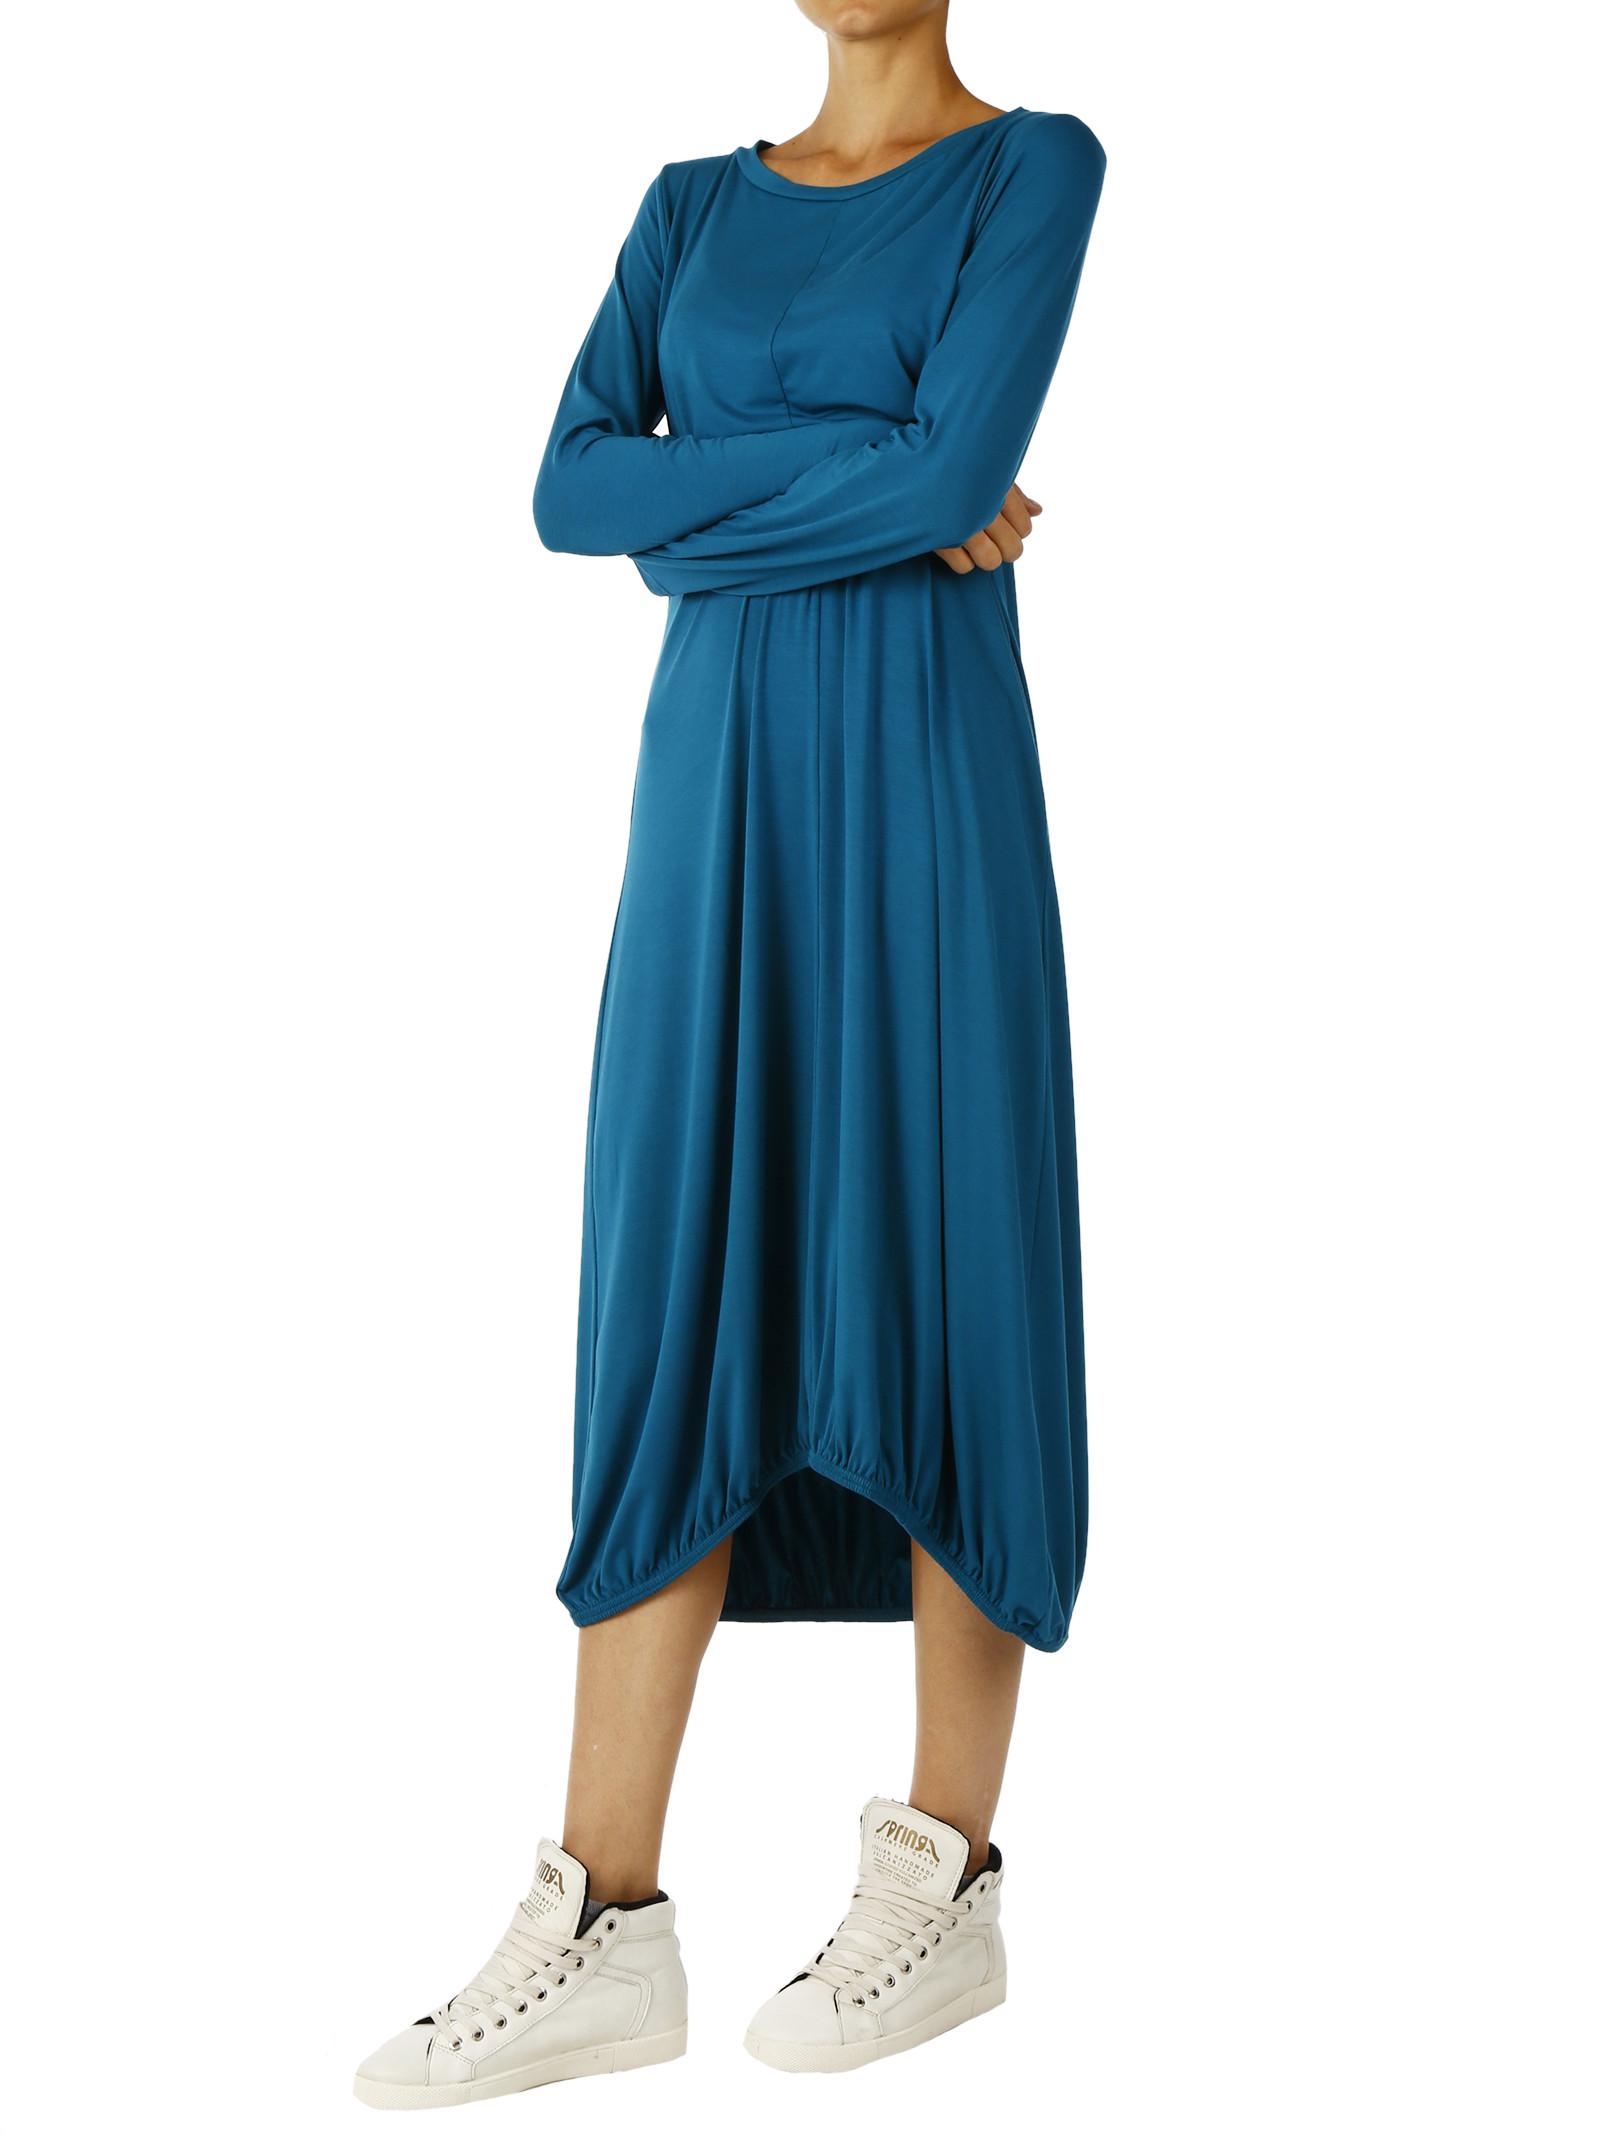 Altalana 100% Viscose Extrafine Long Dress